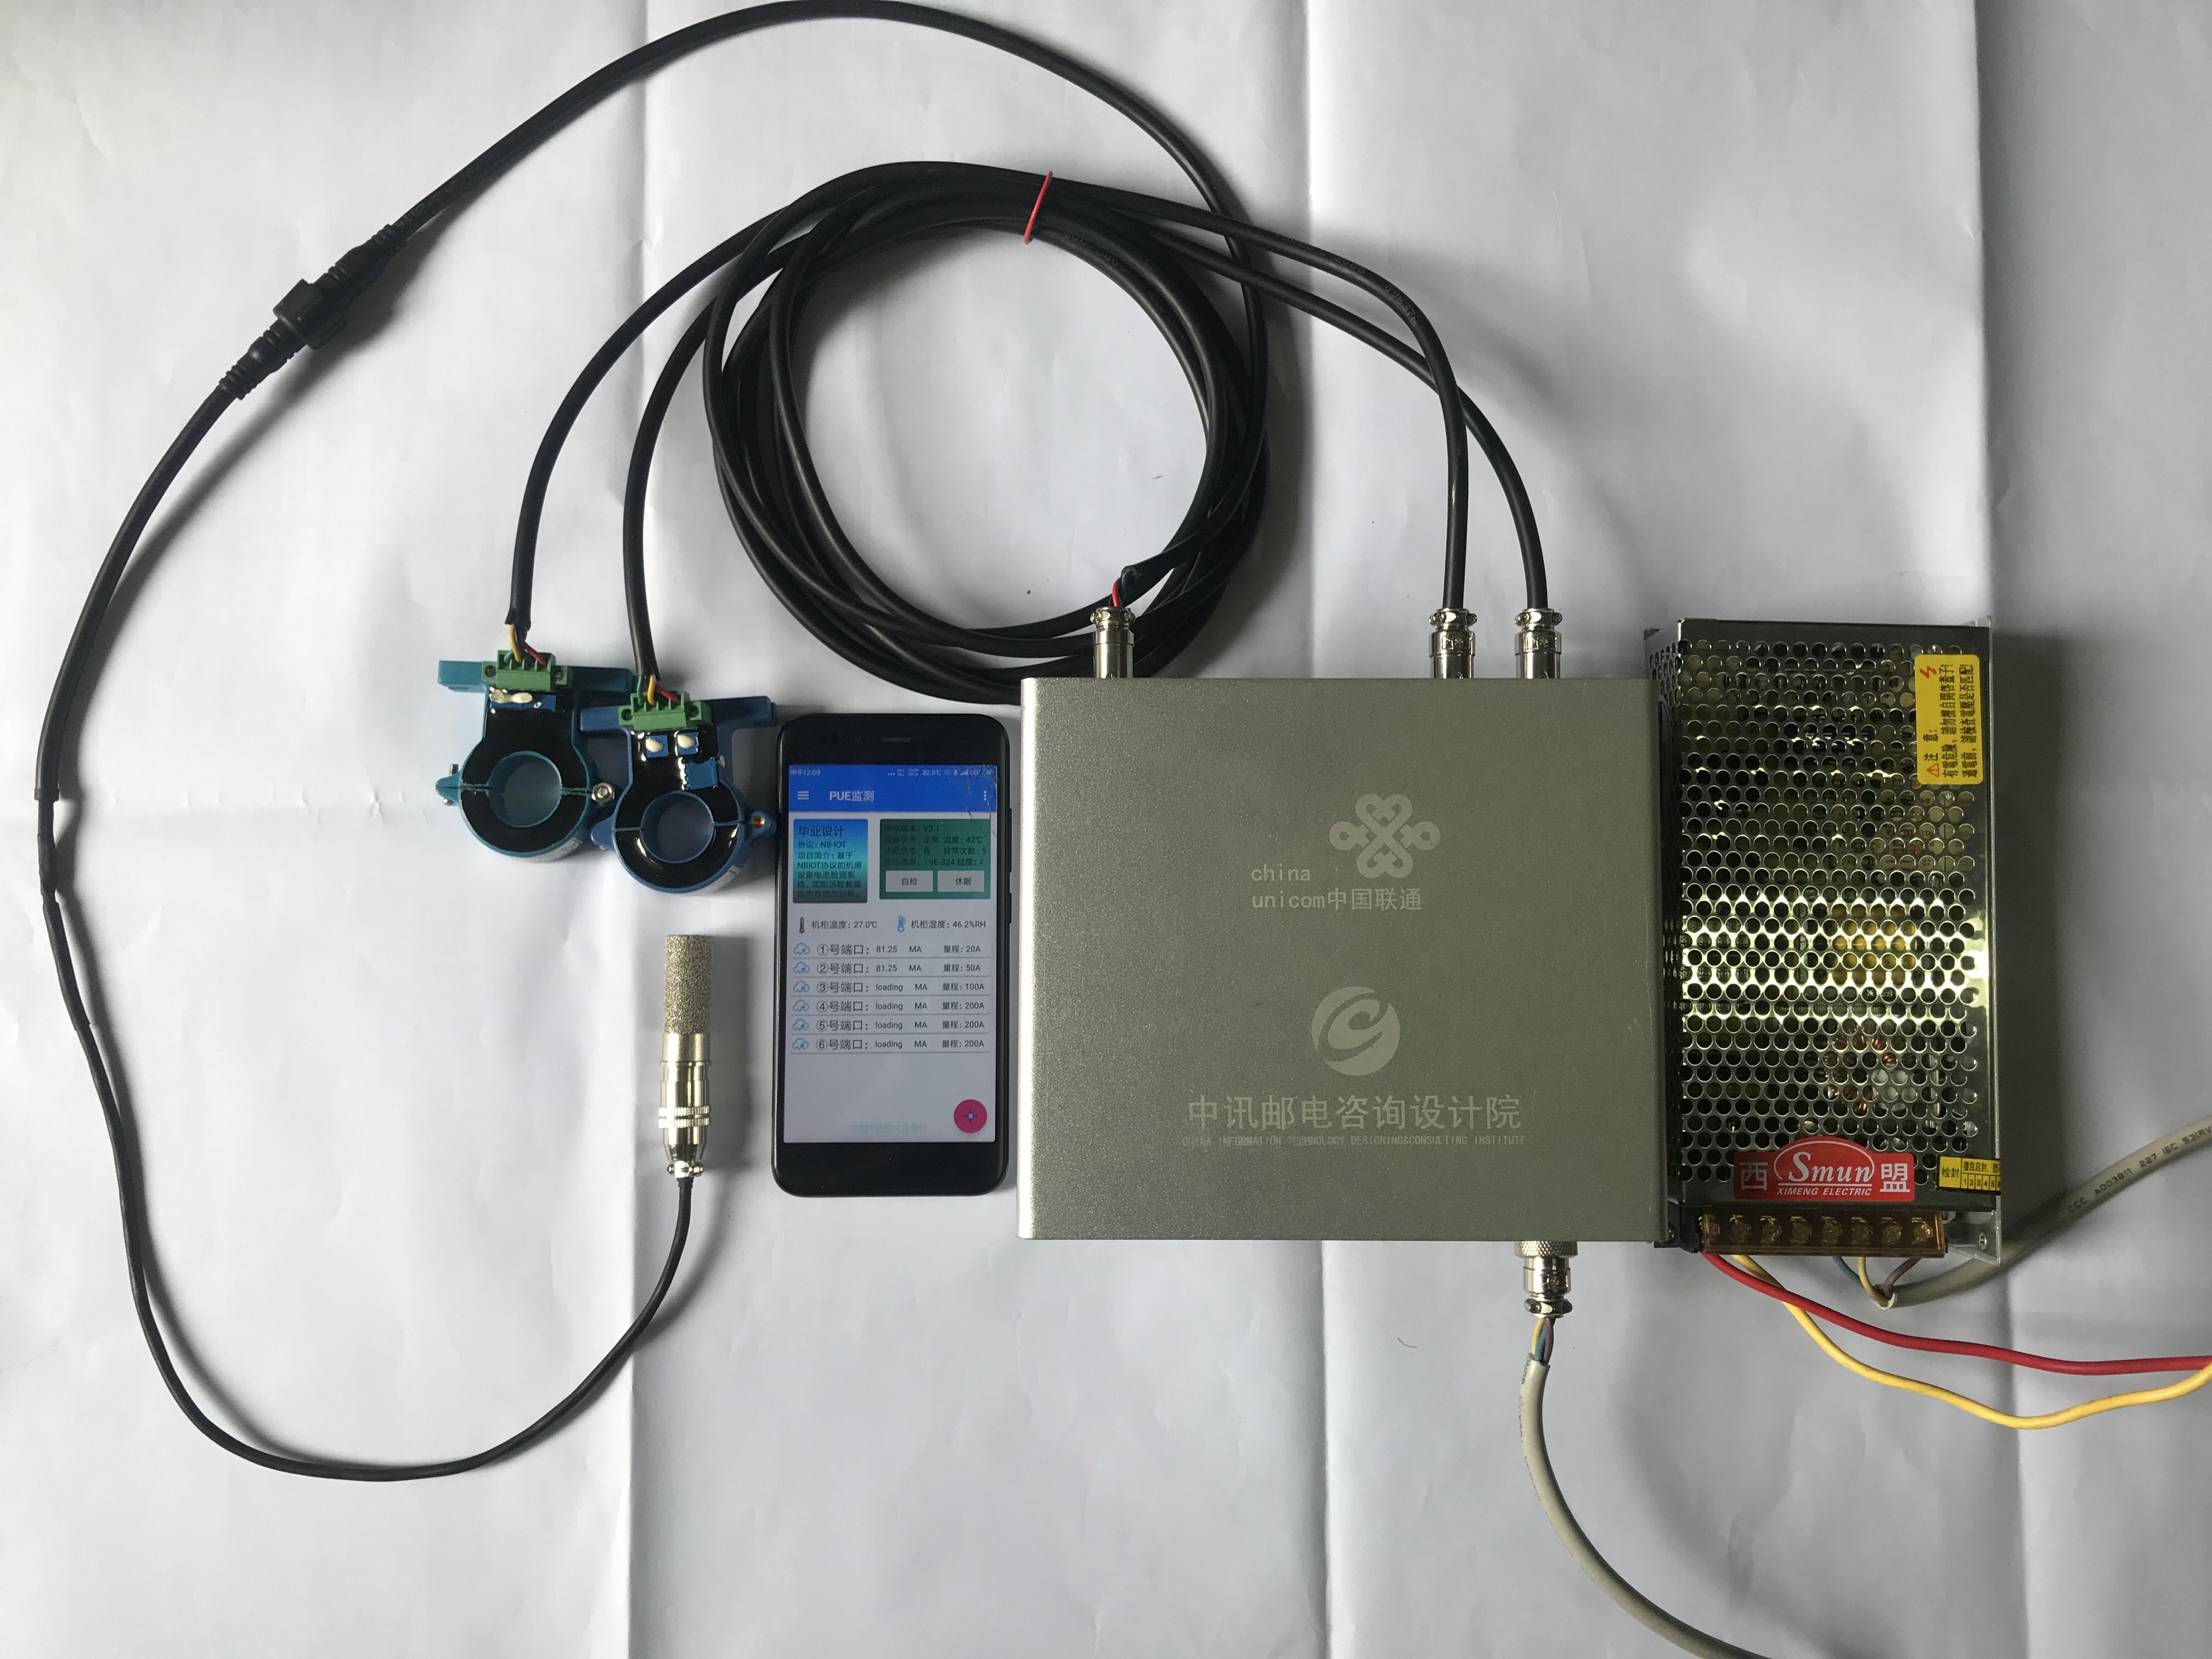 STM32F103 + RT-thread operating system + M5311NB modules